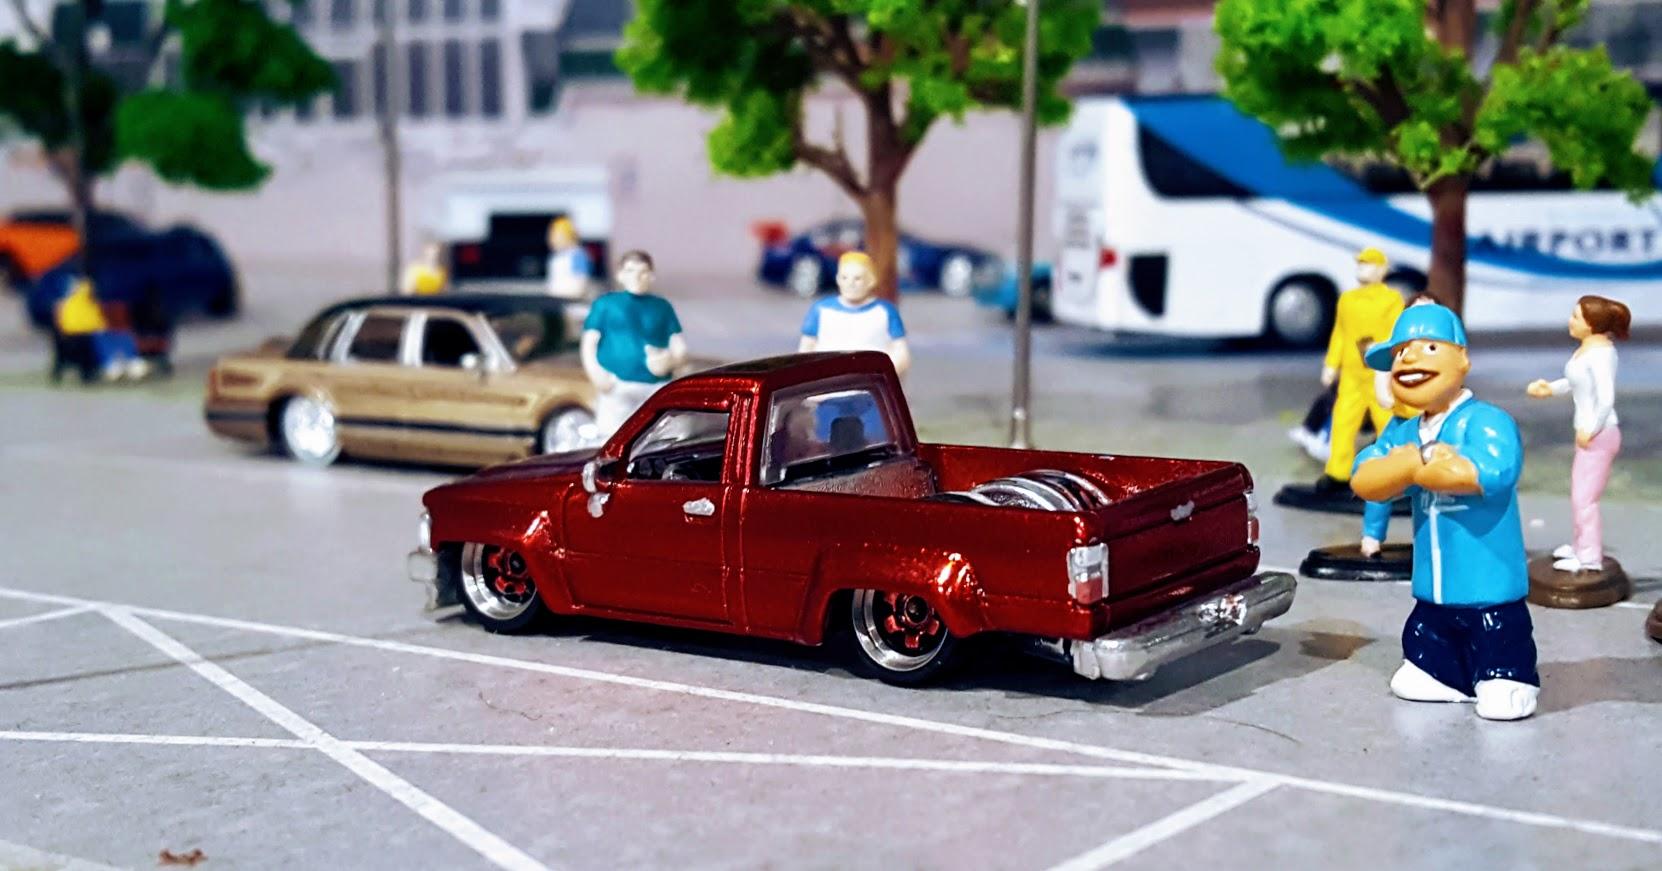 Slammed Toyota Hilux - The Lowlux | My Custom Hotwheels